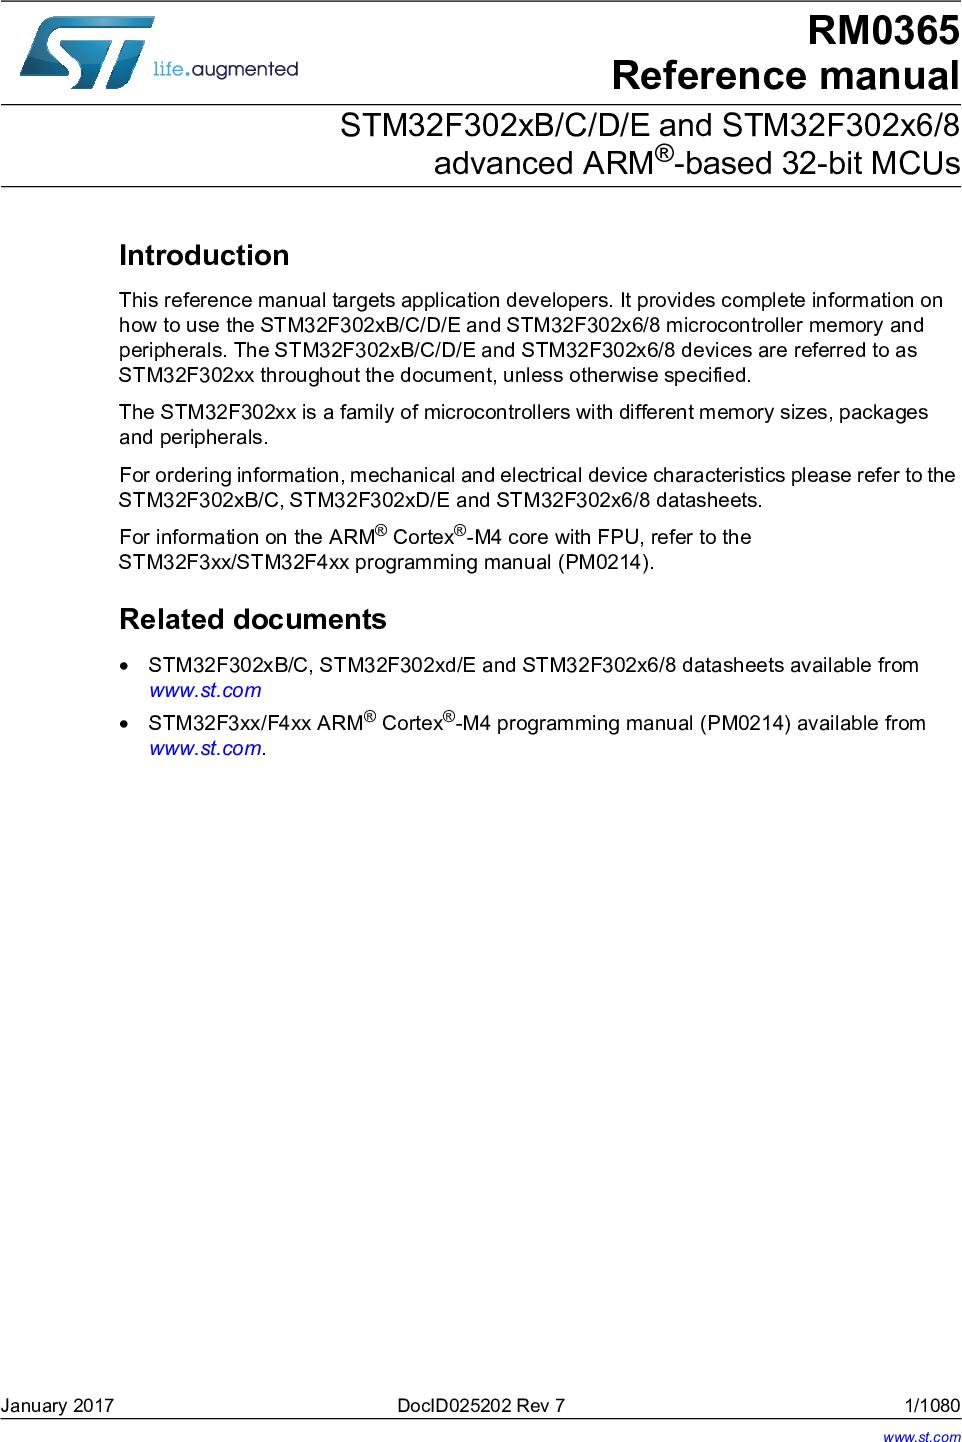 STM32F302xB/C/D/E And STM32F302x6/8 Advanced ARM® based 32